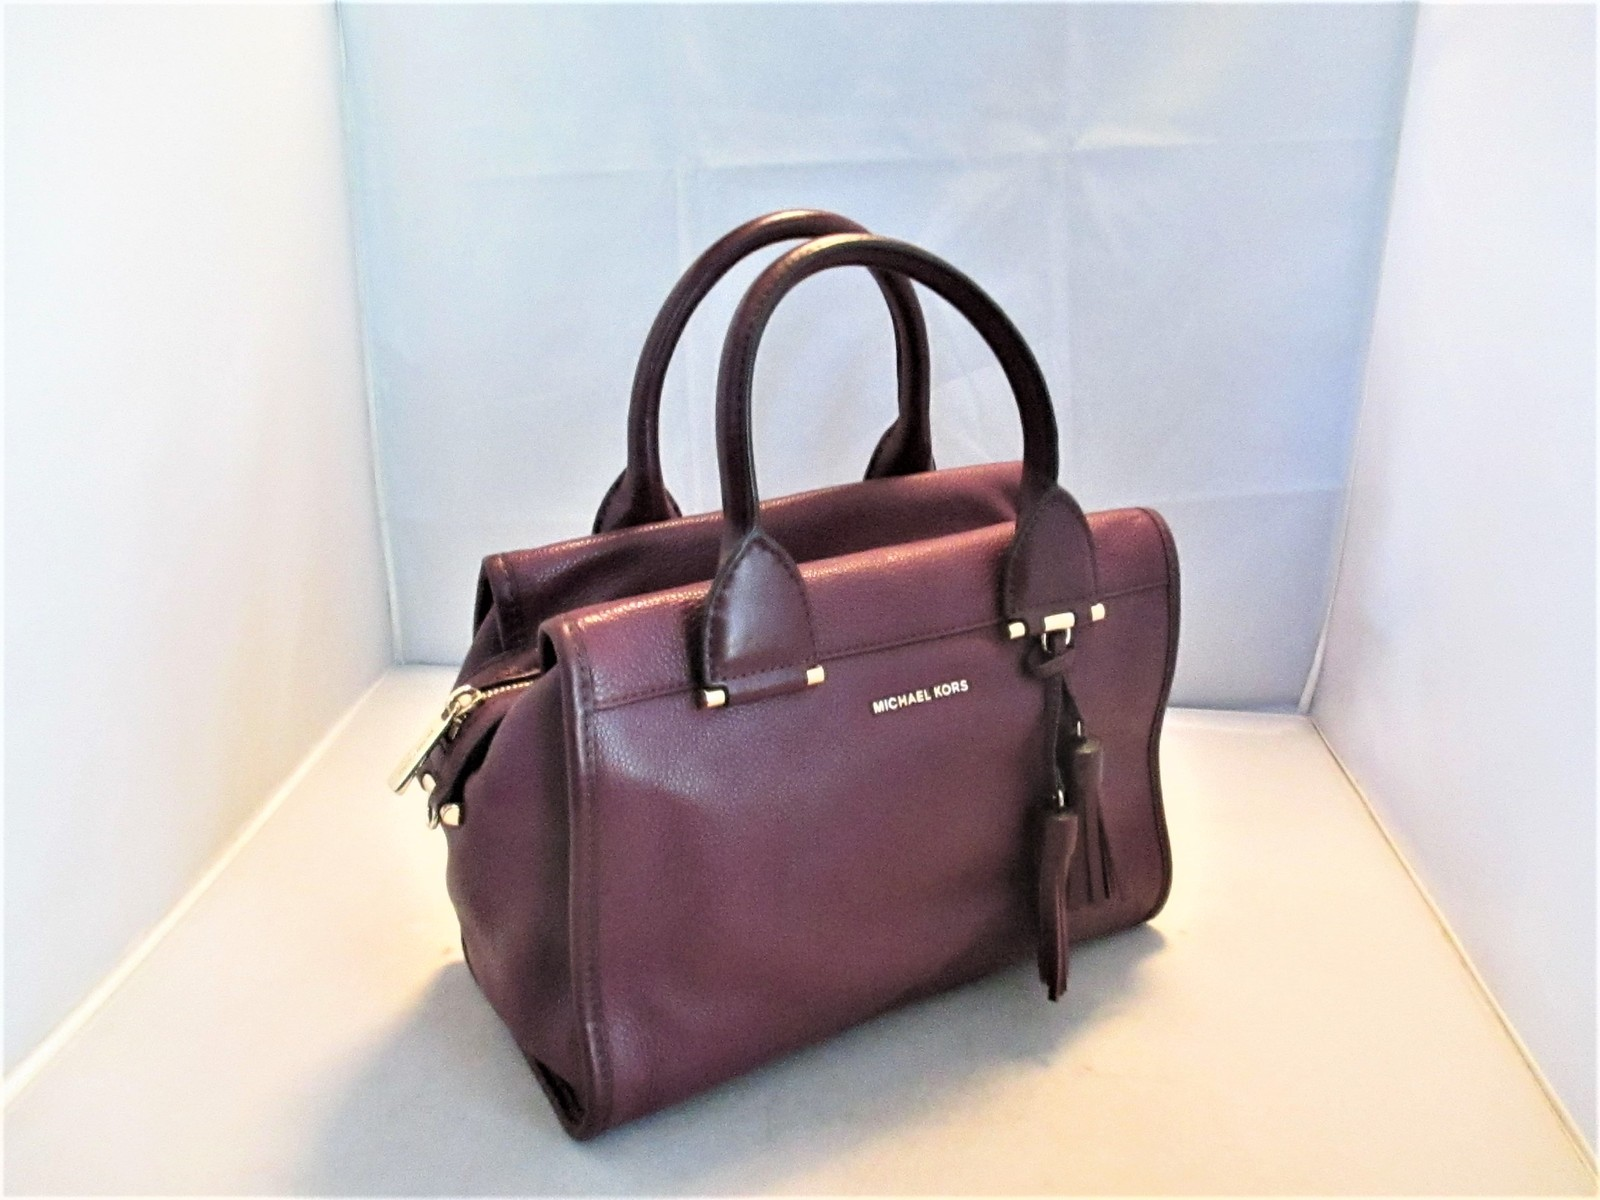 56b626cc7a3c Michael Kors Geneva Large Leather Satchel, Shoulder Bag, Tote, Cross-Body  $378